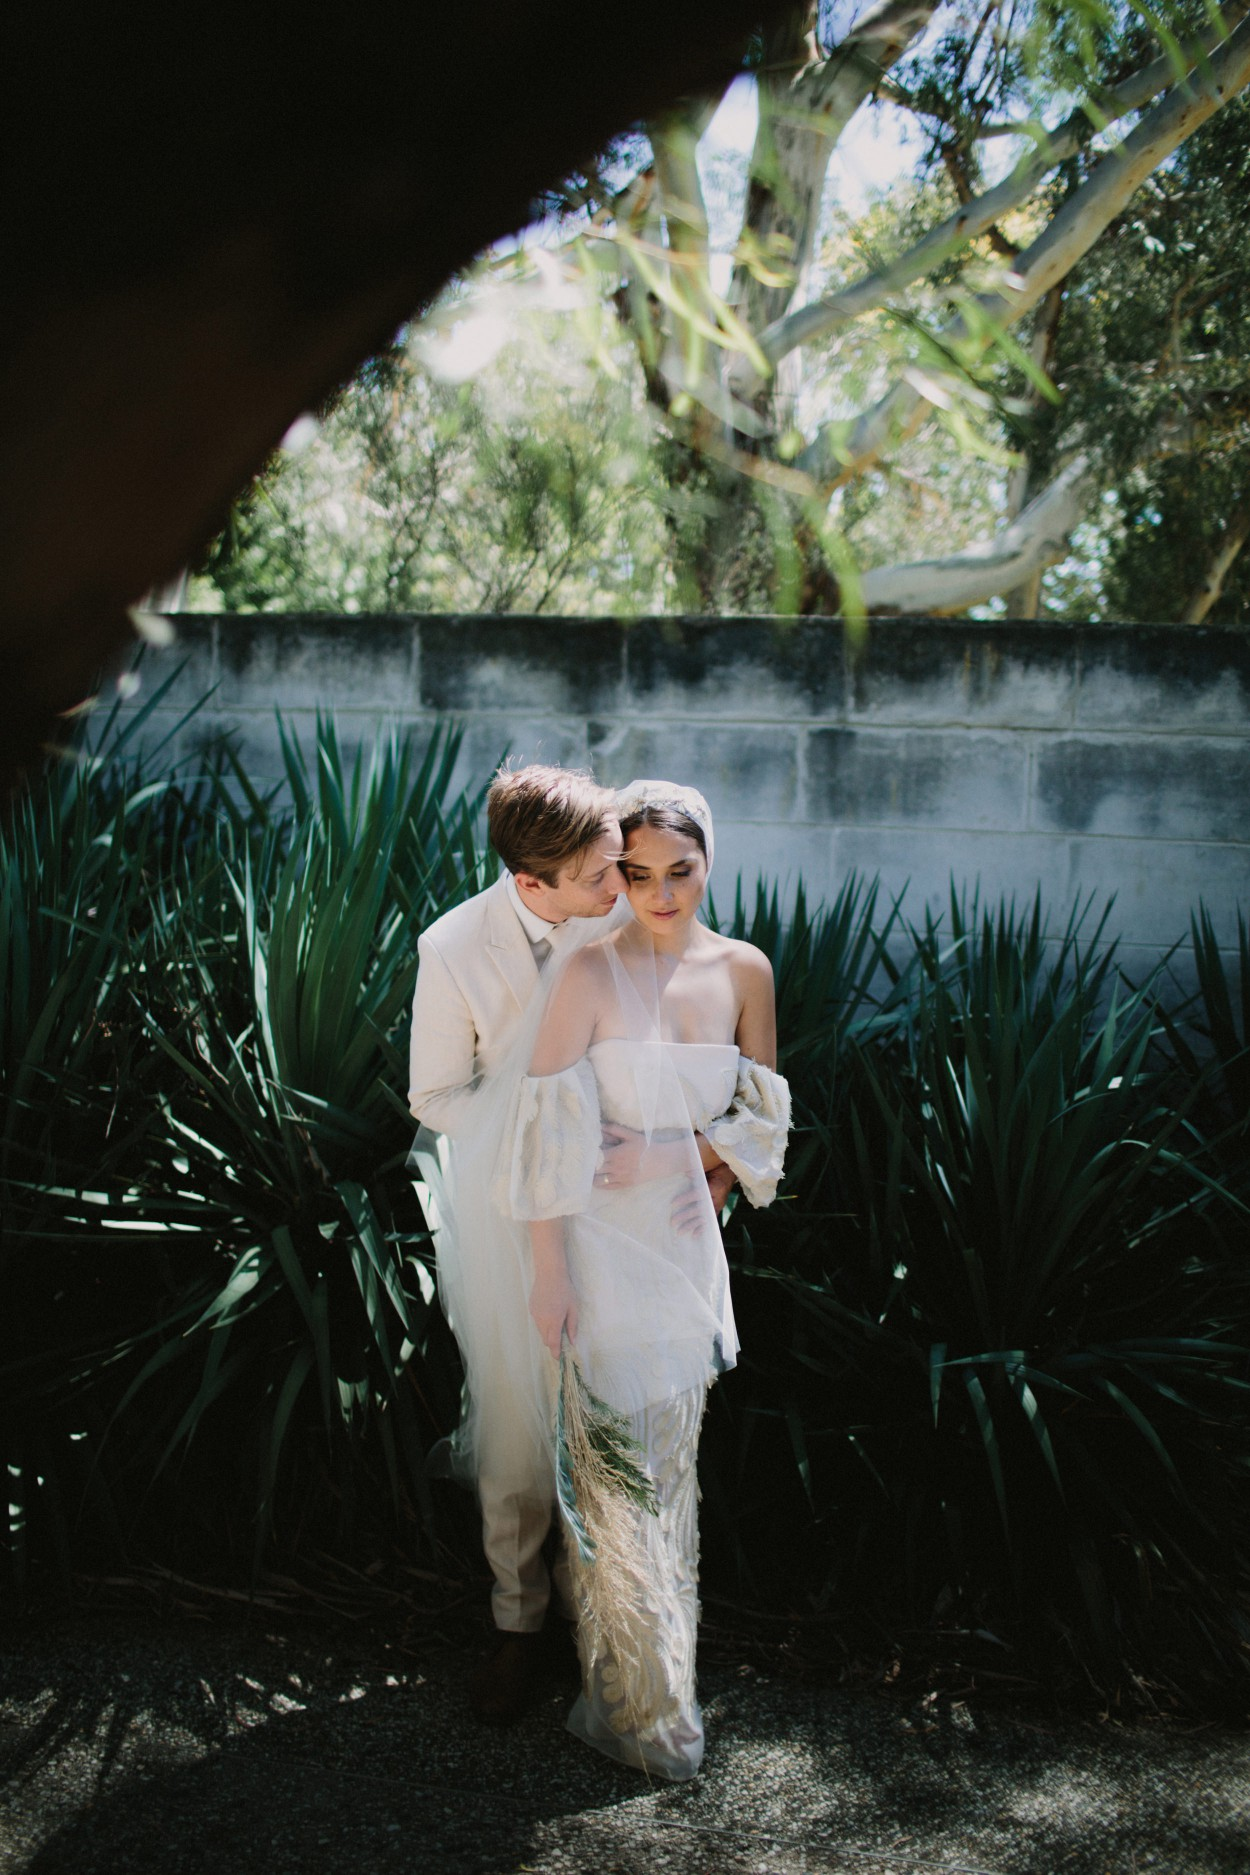 I-Got-You-Babe-Weddings-Heide-Museum-of-Modern-Art-Elopement-Susie-Nathan080.jpg